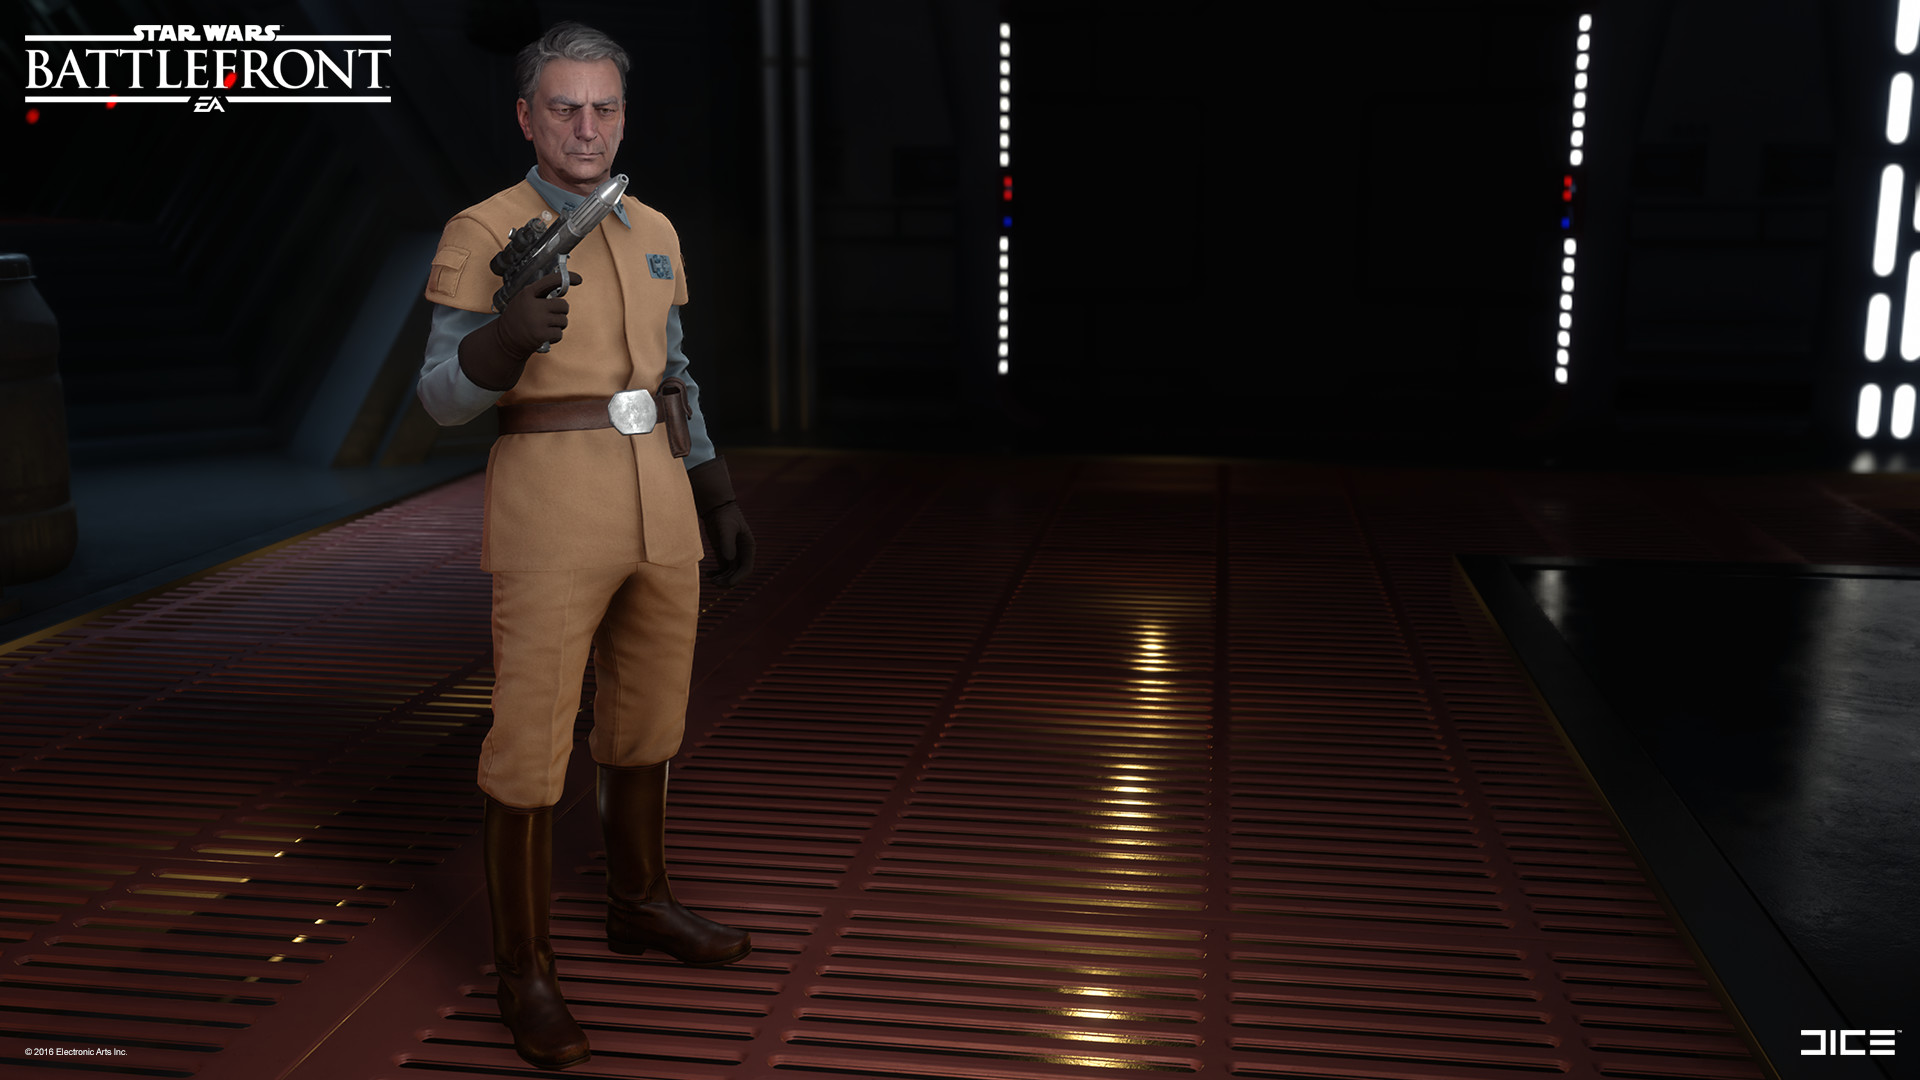 Rebel Officer Appearance Star Wars Battlefront Wiki Fandom